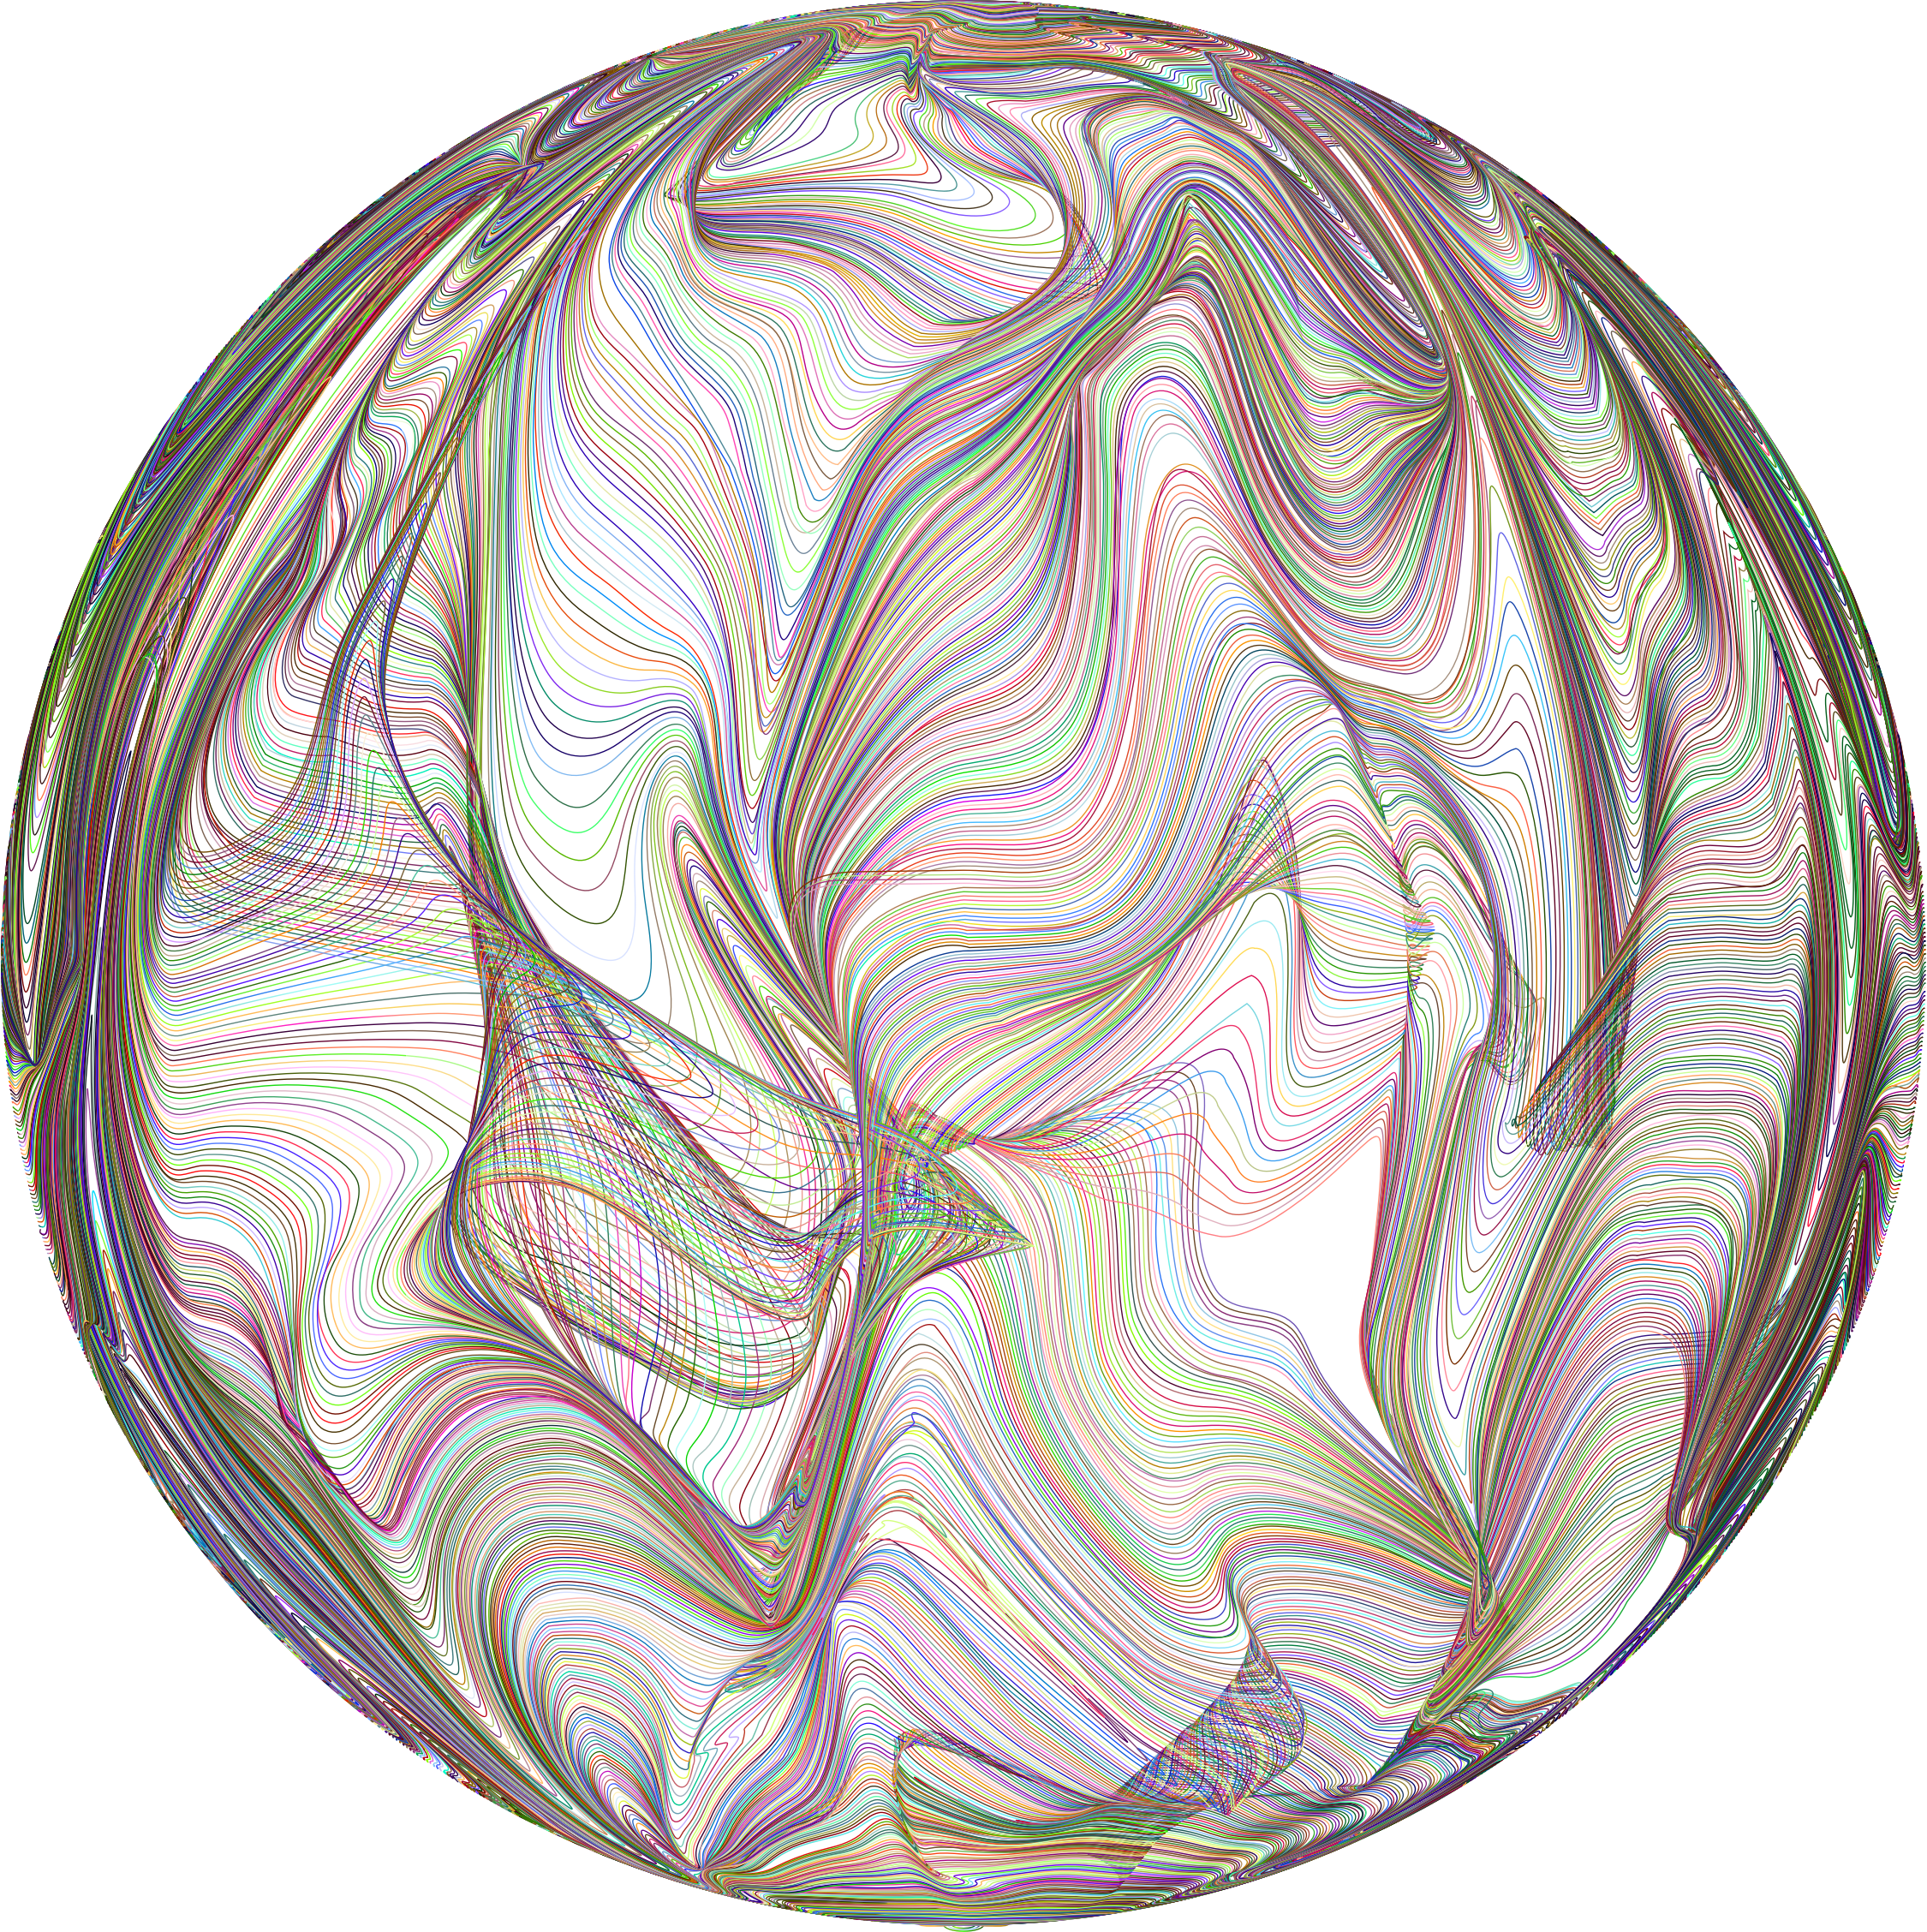 Sphere clipart line Sphere Line Distorted Prismatic Art